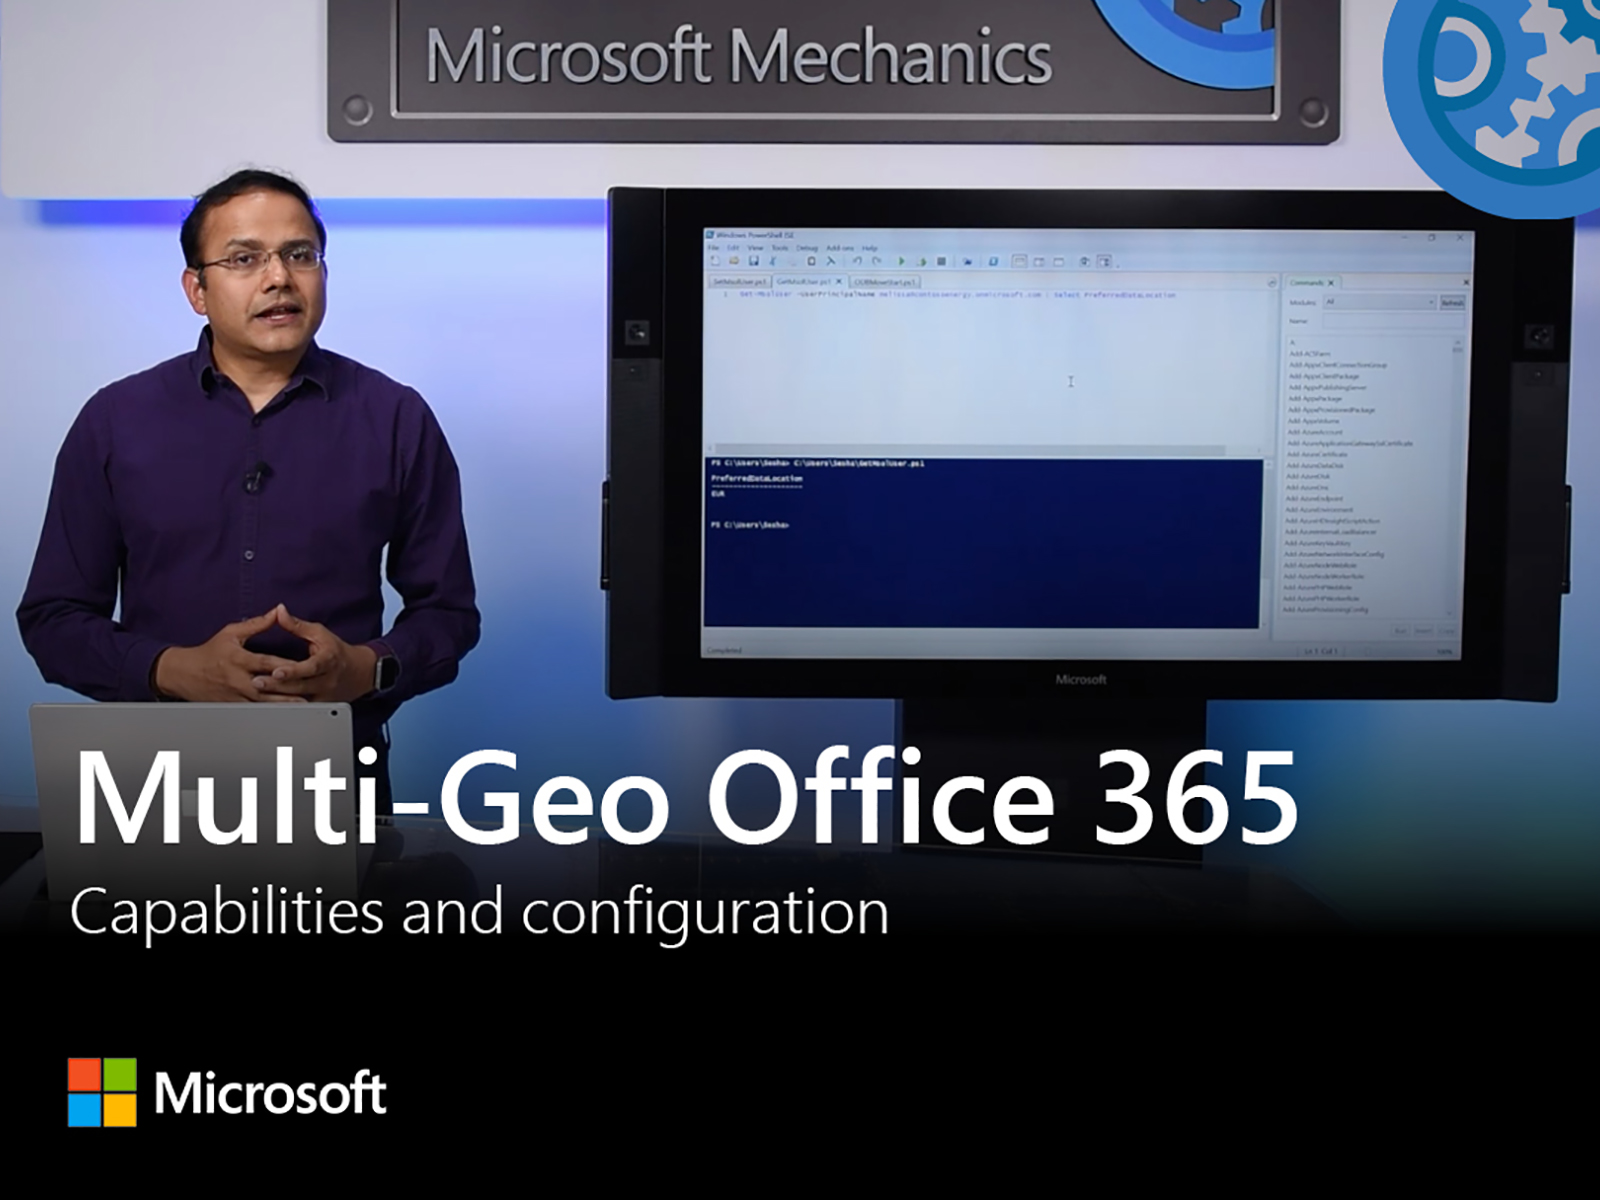 Artwork for Multi-Geo capabilities in Office 365